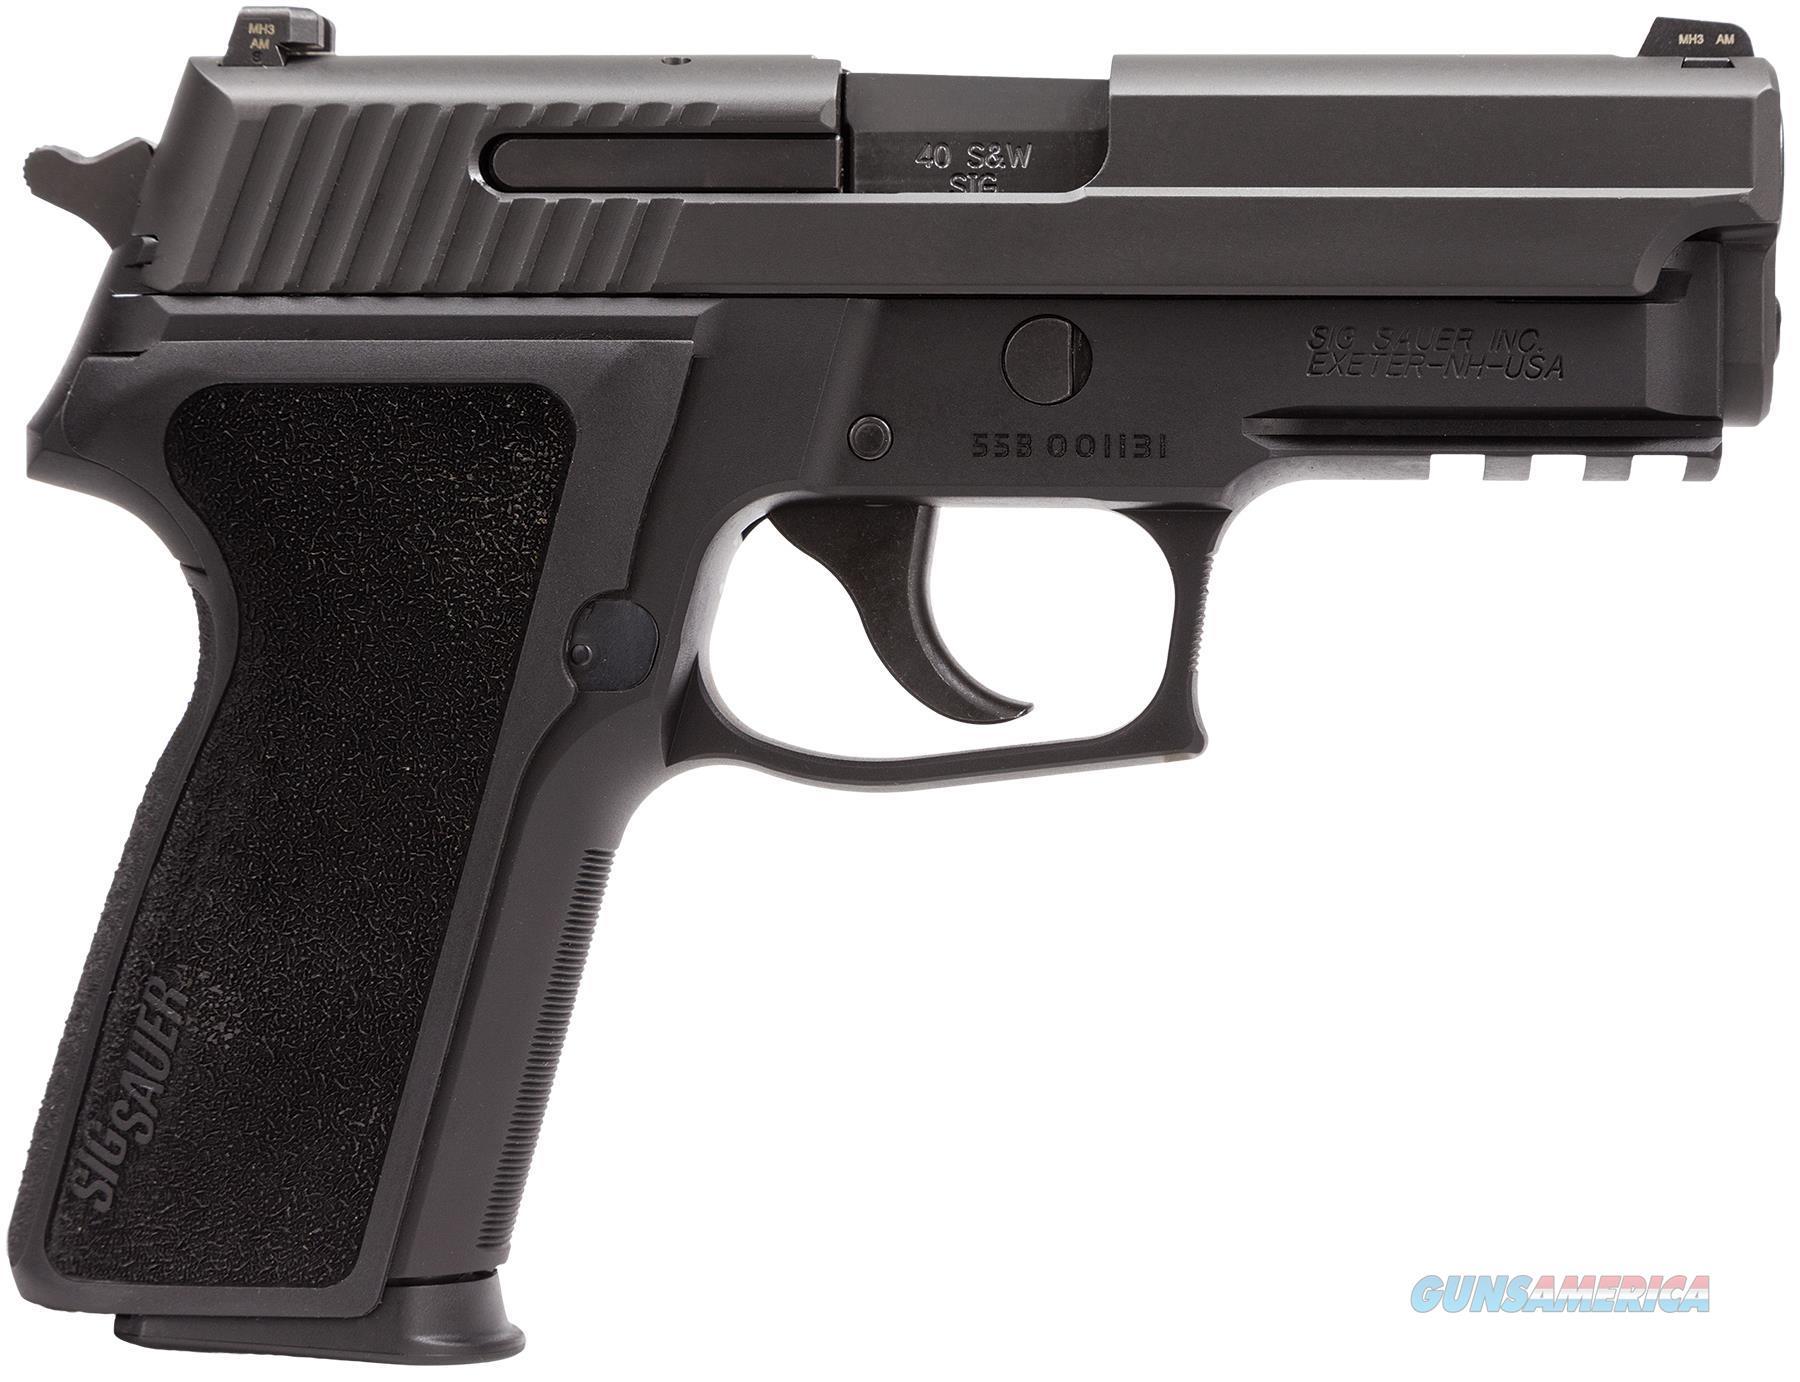 Sig Sauer P229 40S&W Full Blk   Ns E29r40bss     / E29R-40-BSS  Guns > Pistols > S Misc Pistols